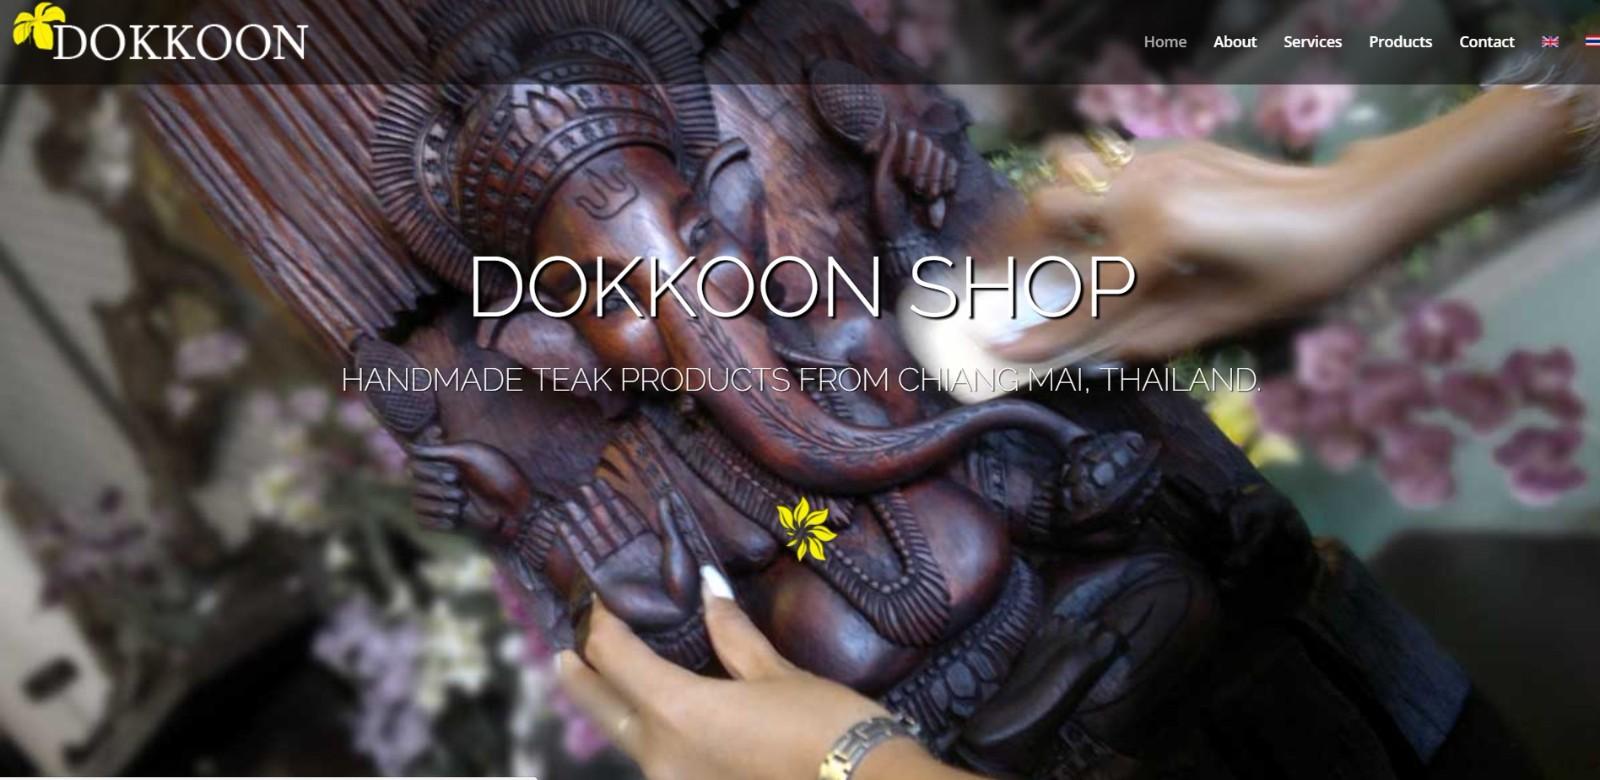 Cửa hàng Dokkoon